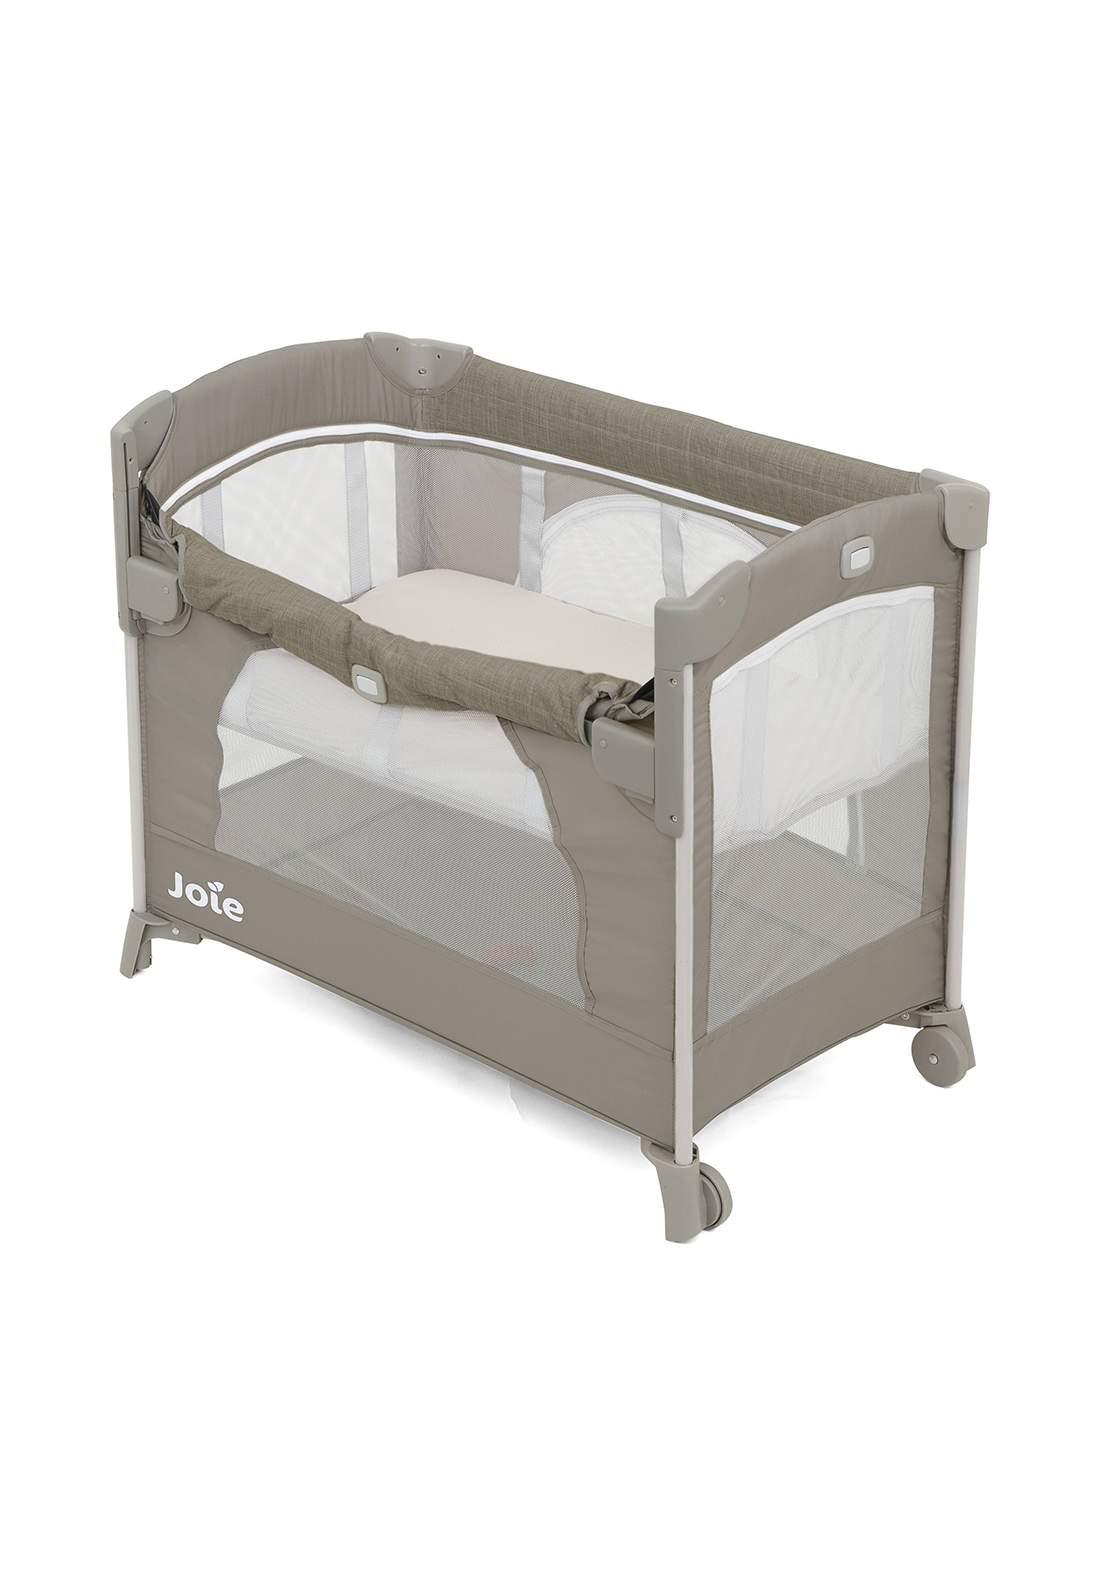 سرير نوم للاطفال Joie BabyP1807AASTL000 Crib Kubbie Sleep